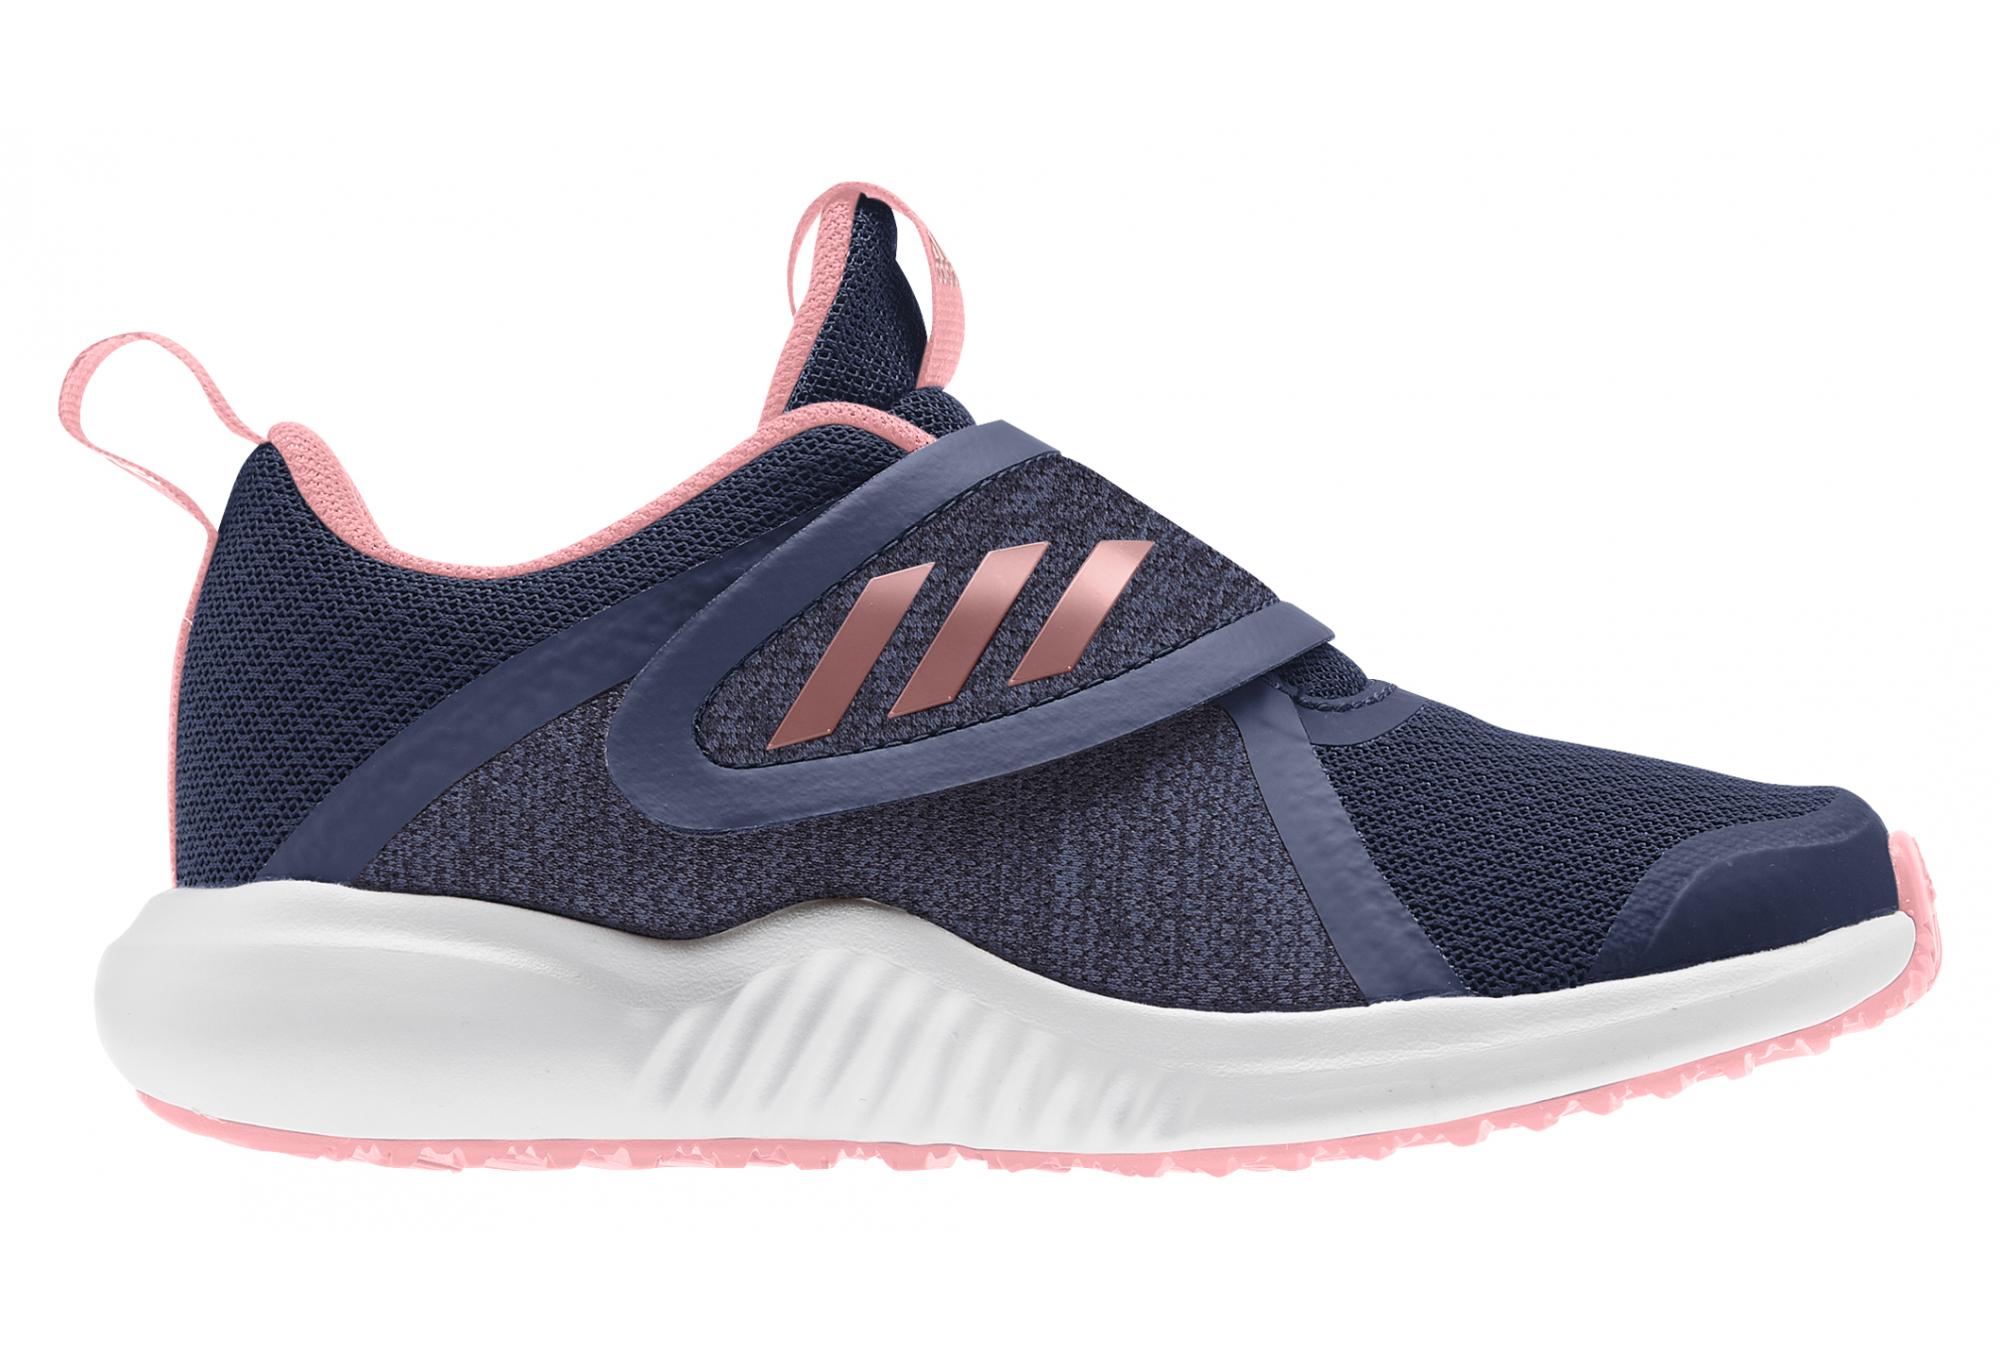 Chaussures junior adidas FortaRun X | Alltricks.com